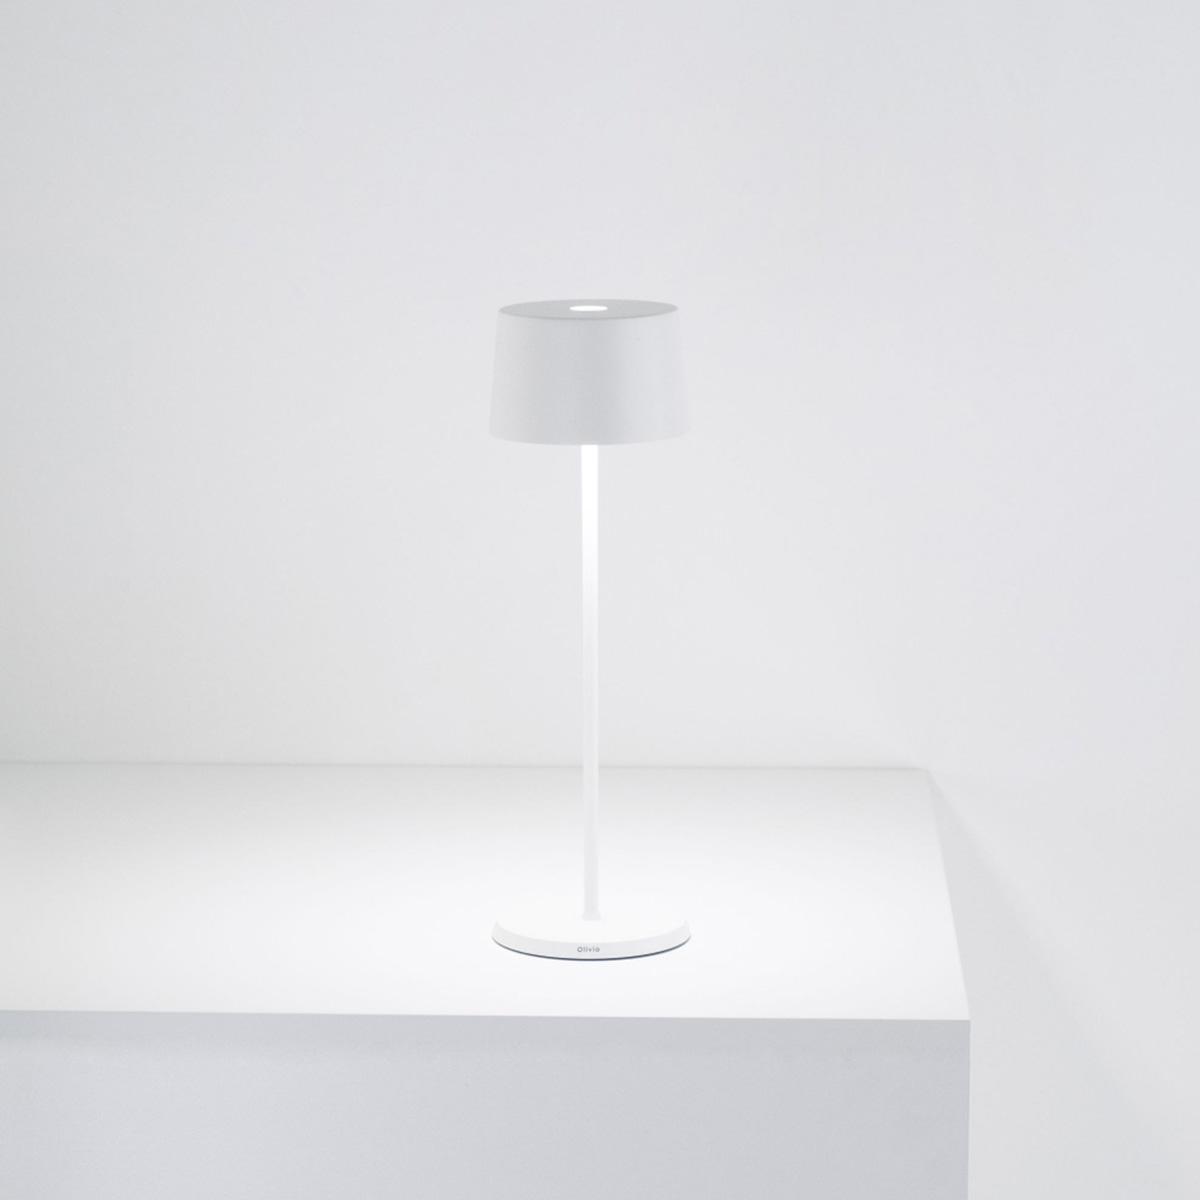 Stona lampa Olivia bela LD0850B3